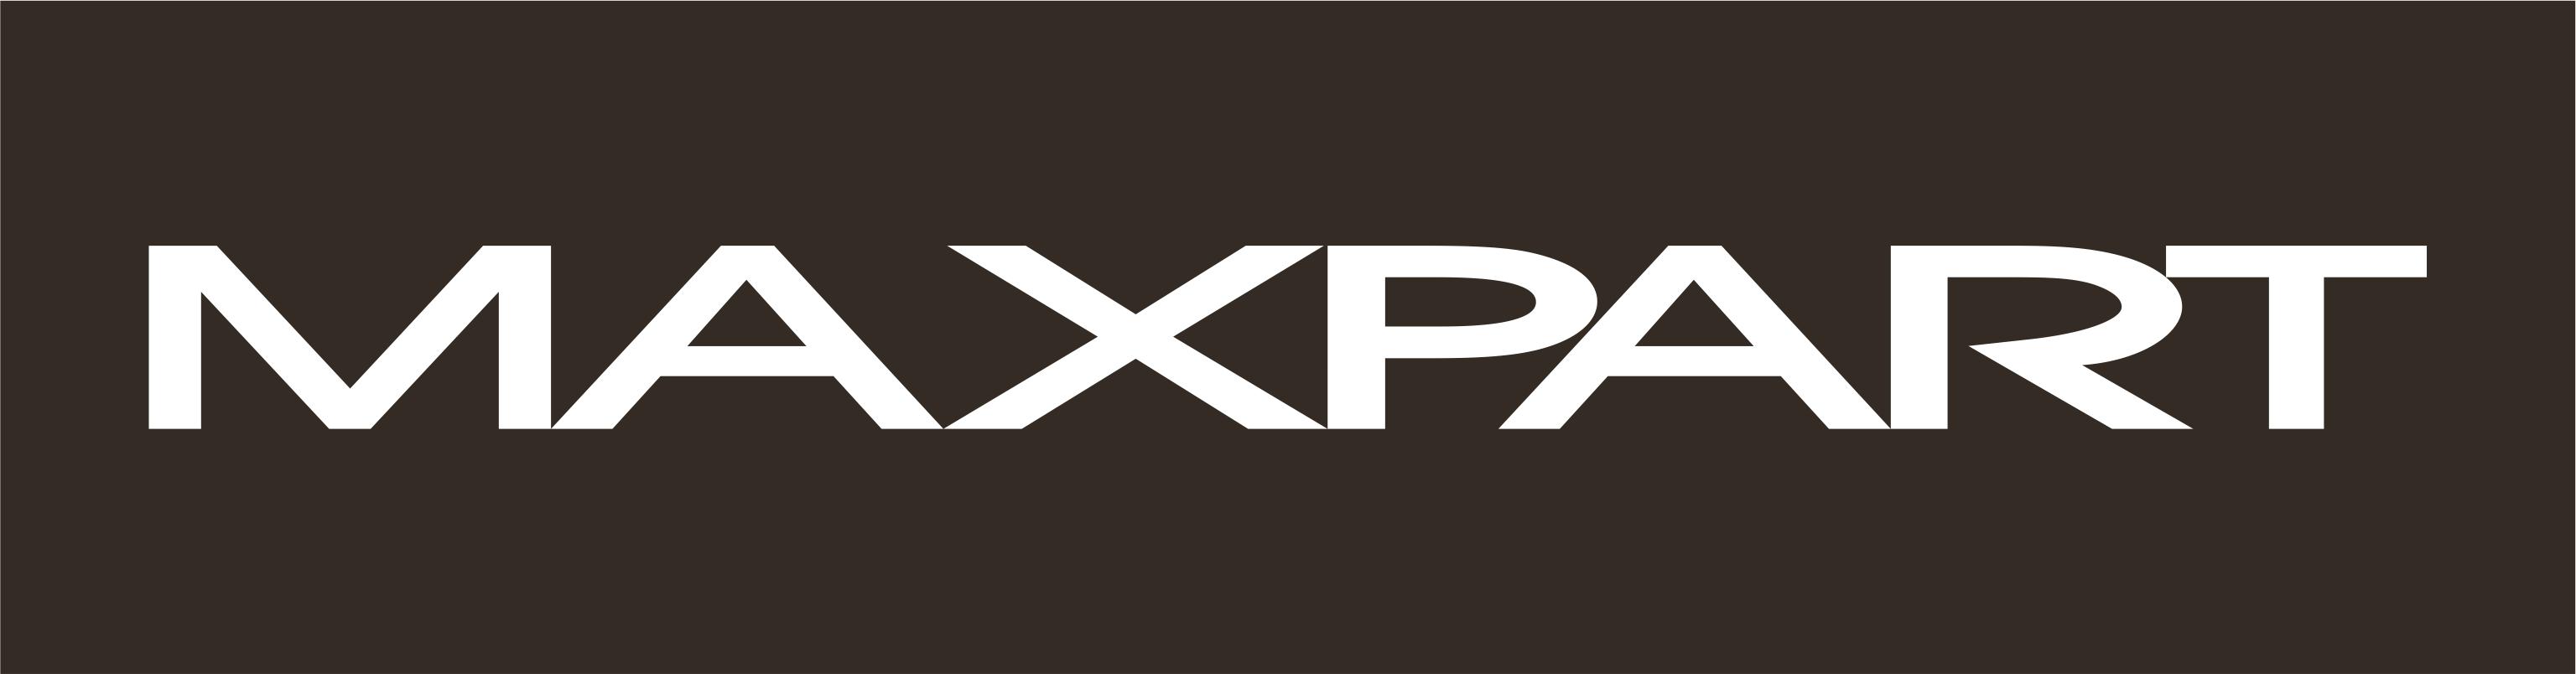 maxpart racing textile veredelungen events firmenbekleidung corporate fashion merchandising rallye motorsport